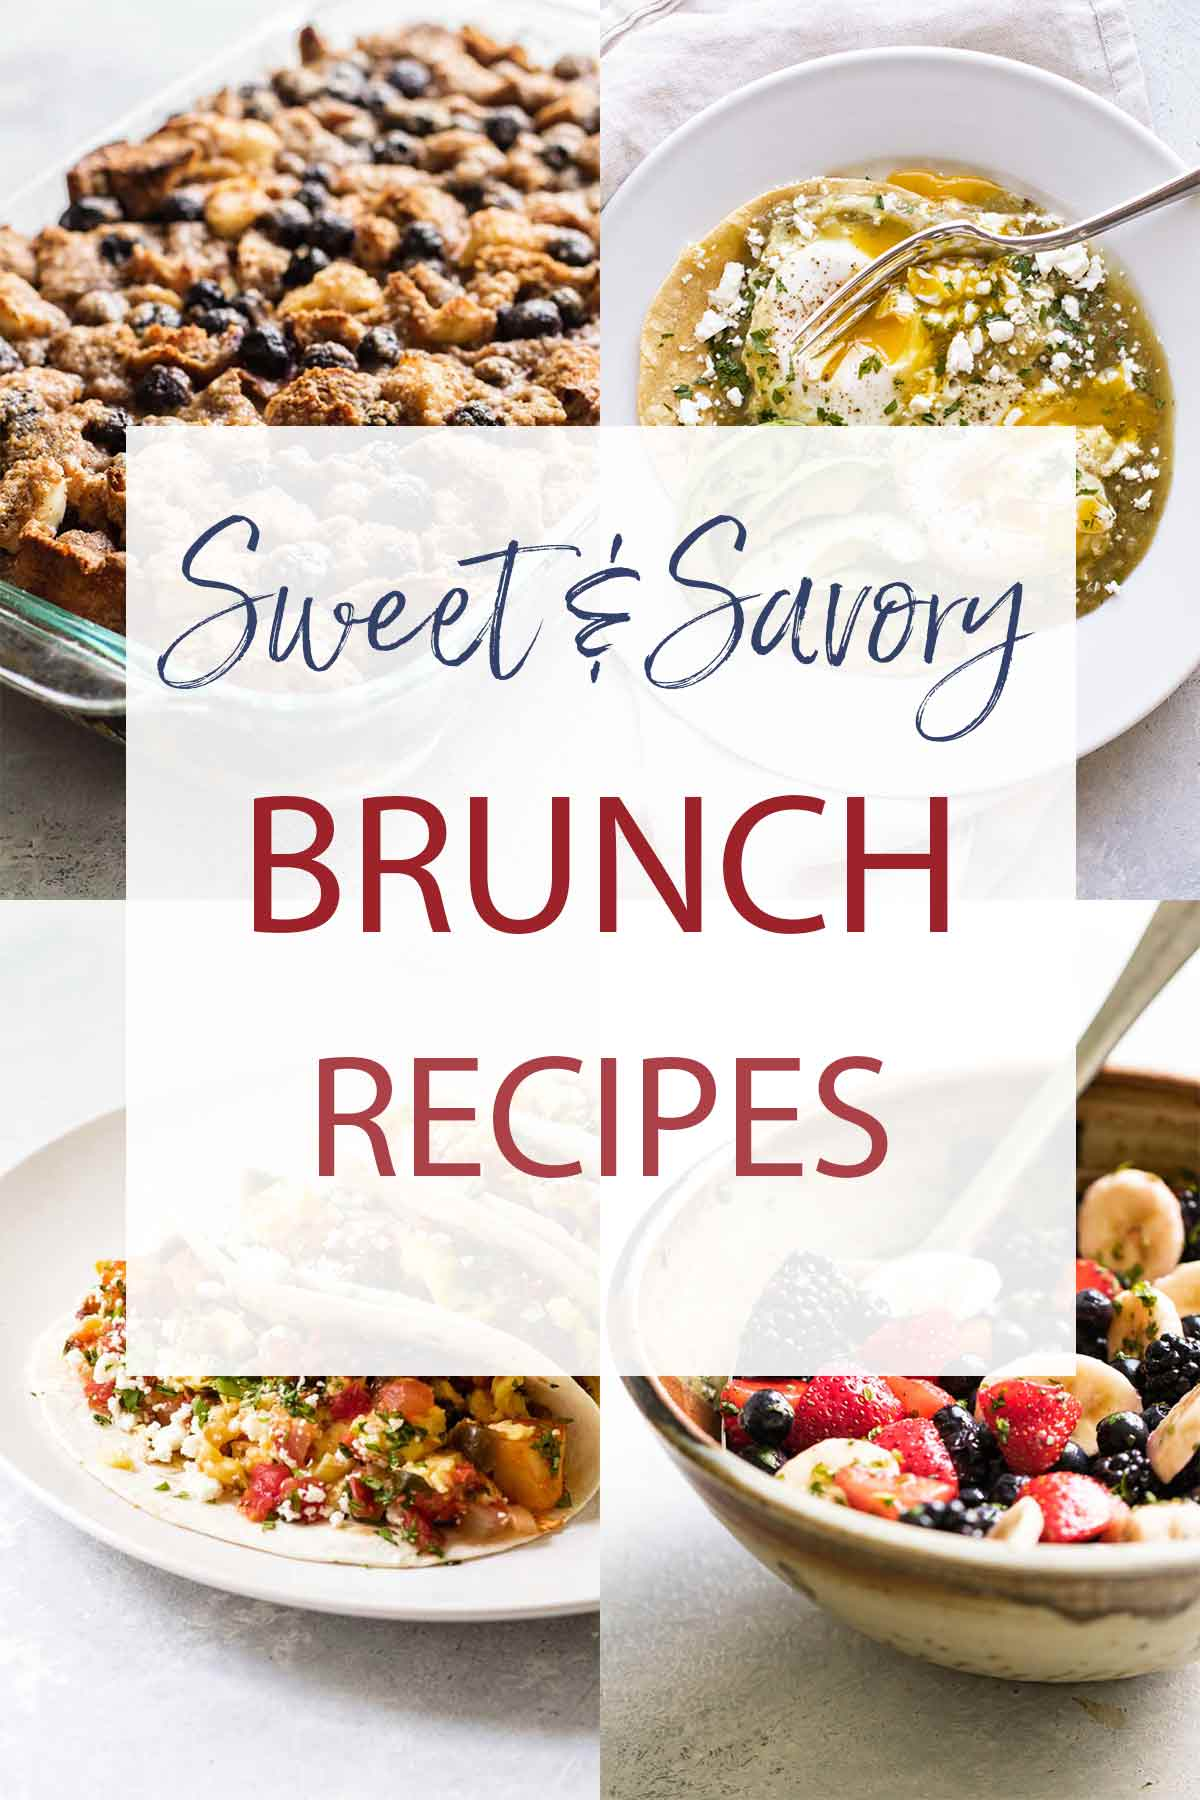 Sweet Savory Brunch Recipes Girl Gone Gourmet